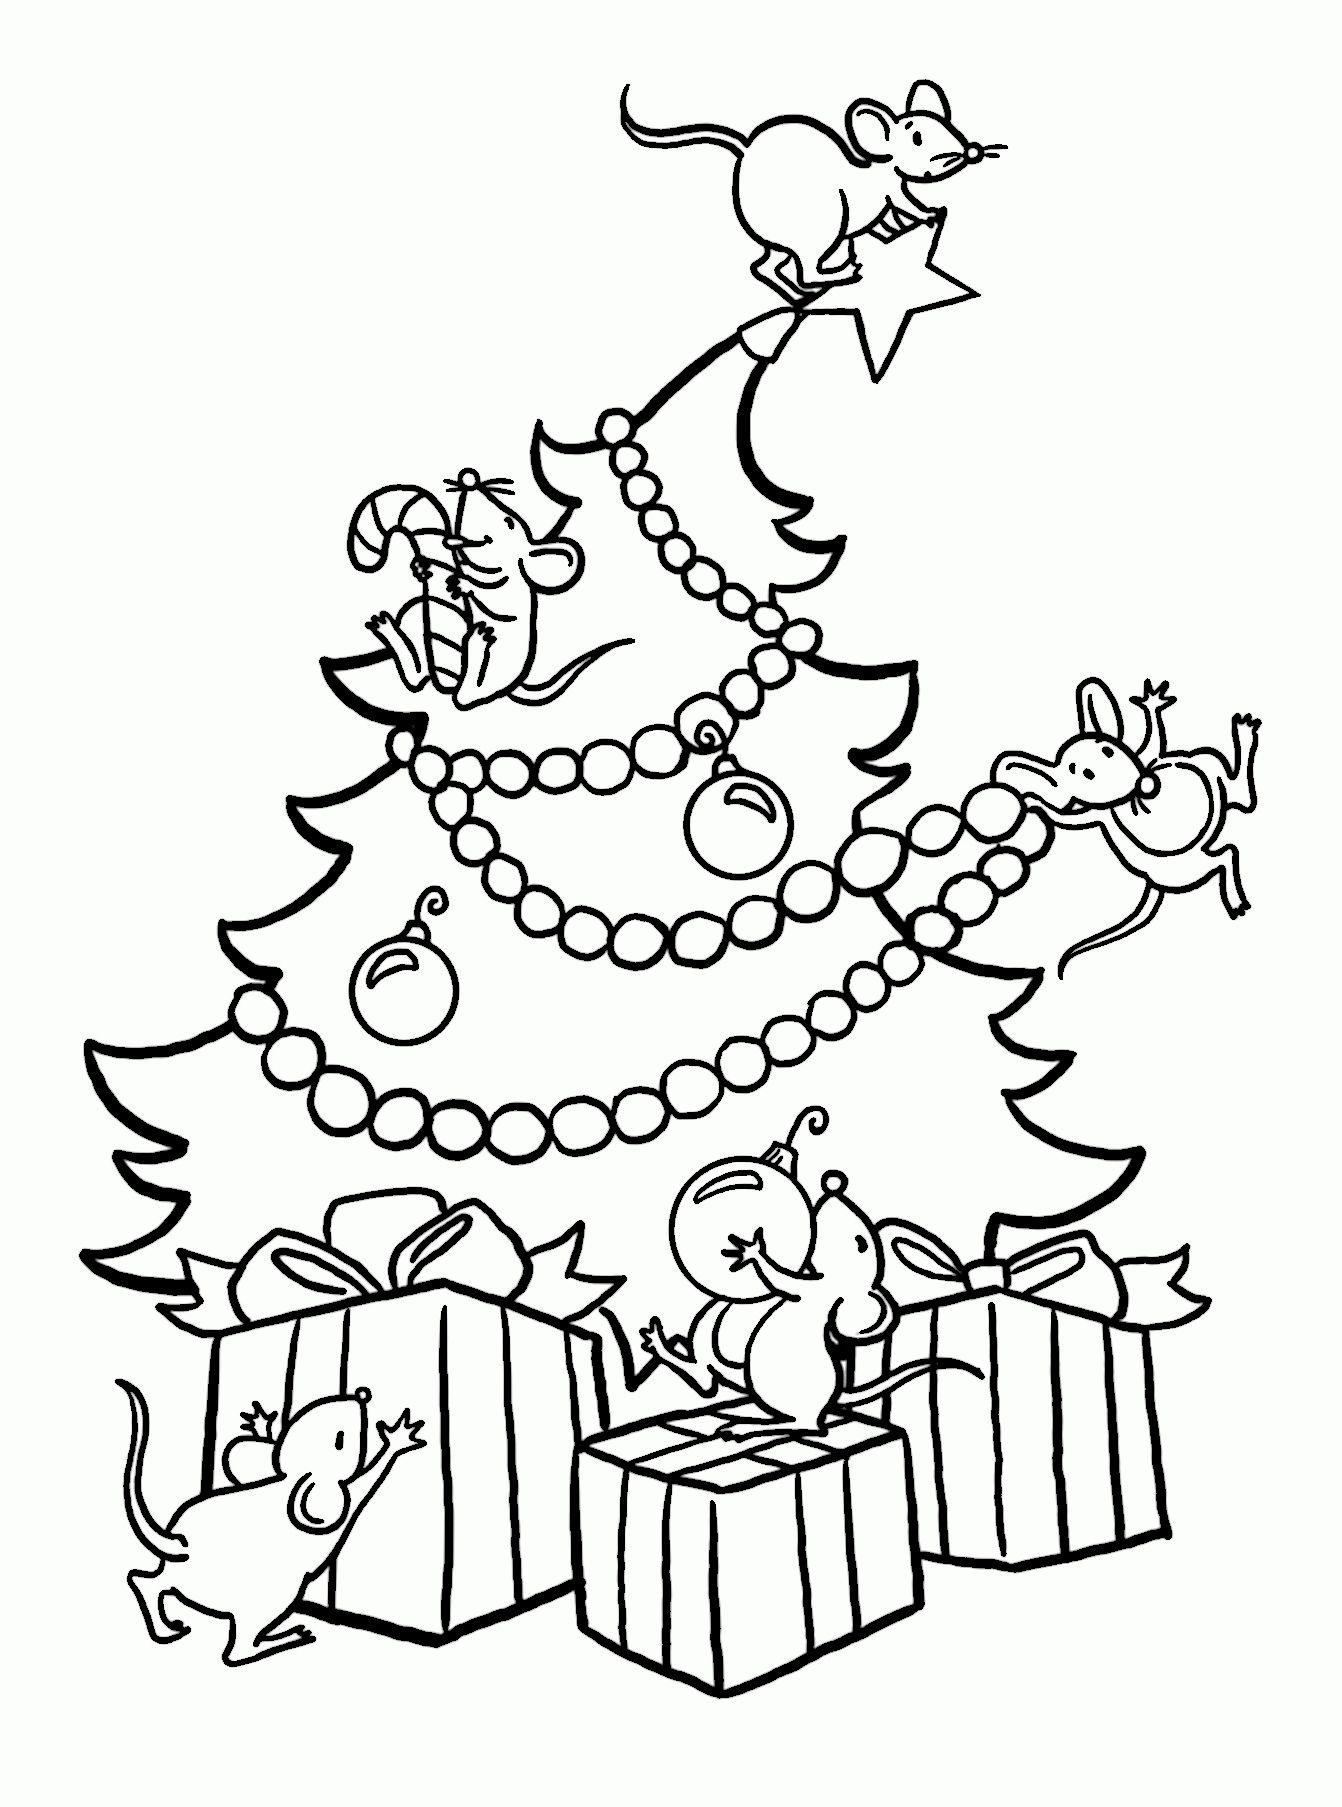 dibujo arbol navidad para colorear | navidad tarjetas | Pinterest ...